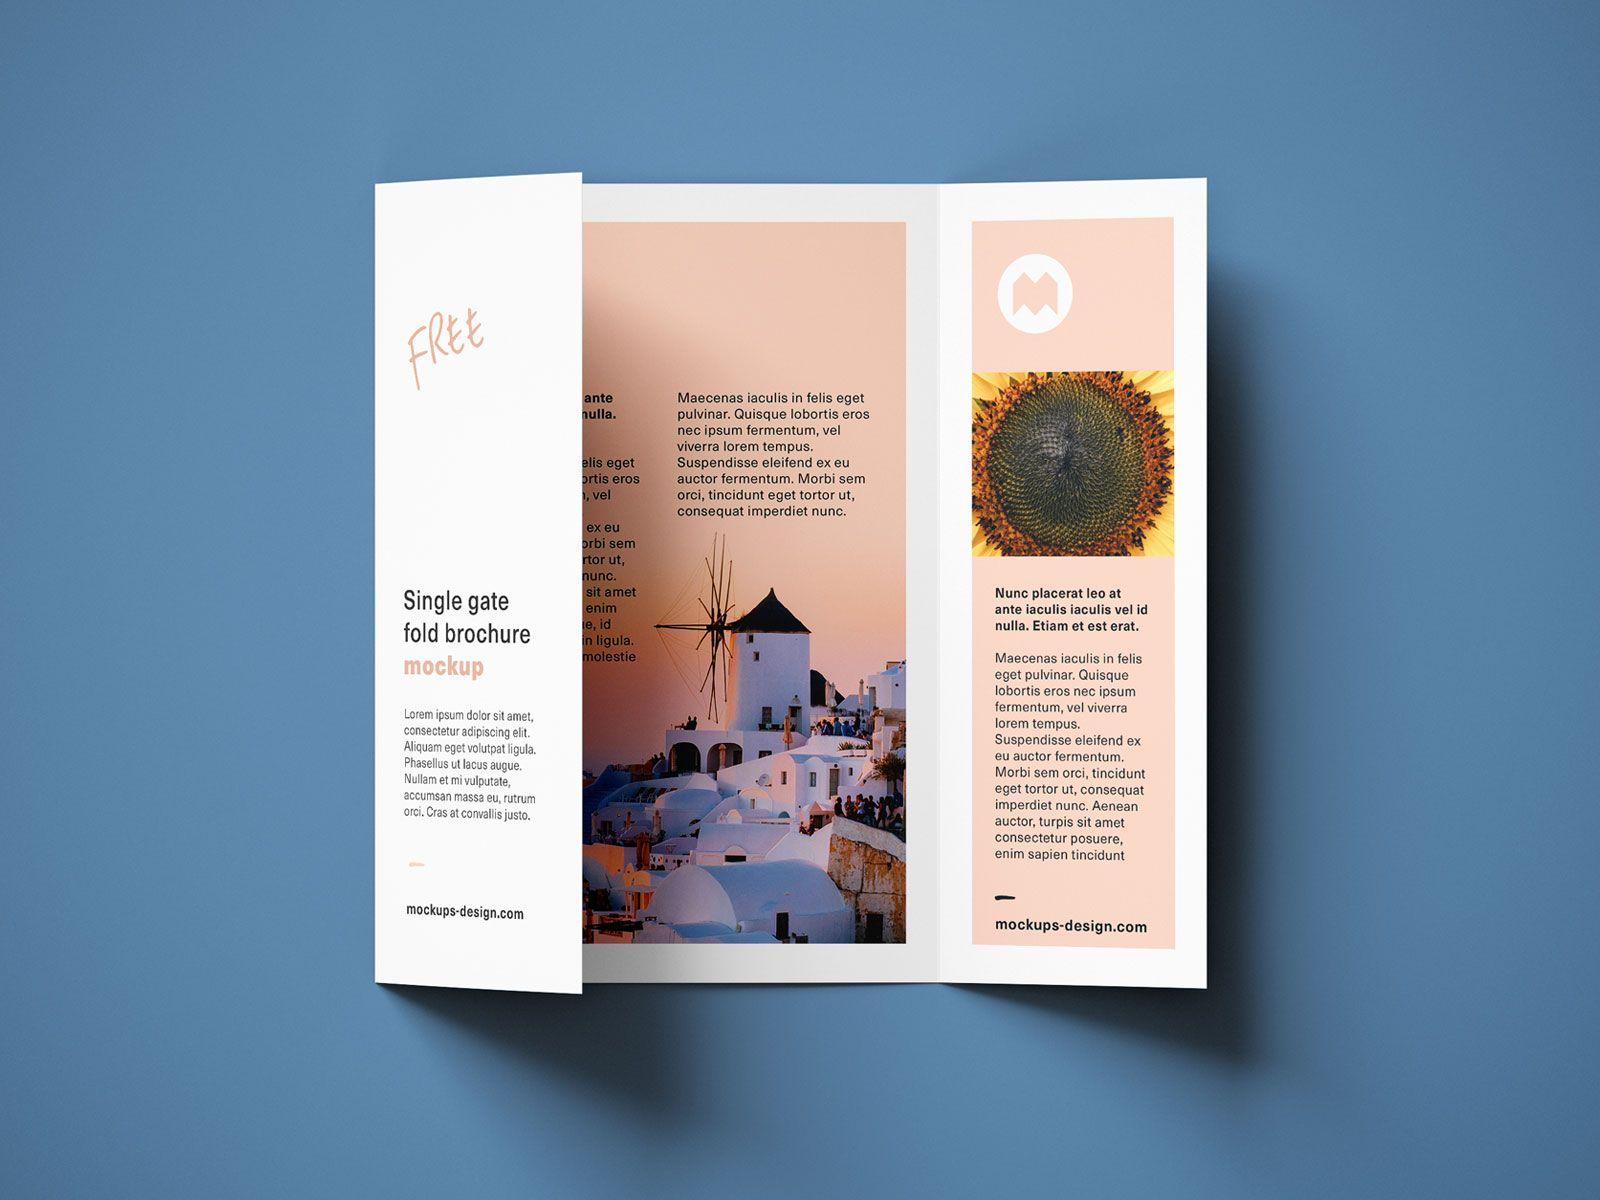 Free A4 Single Gate Fold Brochure Mockup Psd Set Good Mockups Graphic Design Brochure Brochure Brochure Mockup Psd